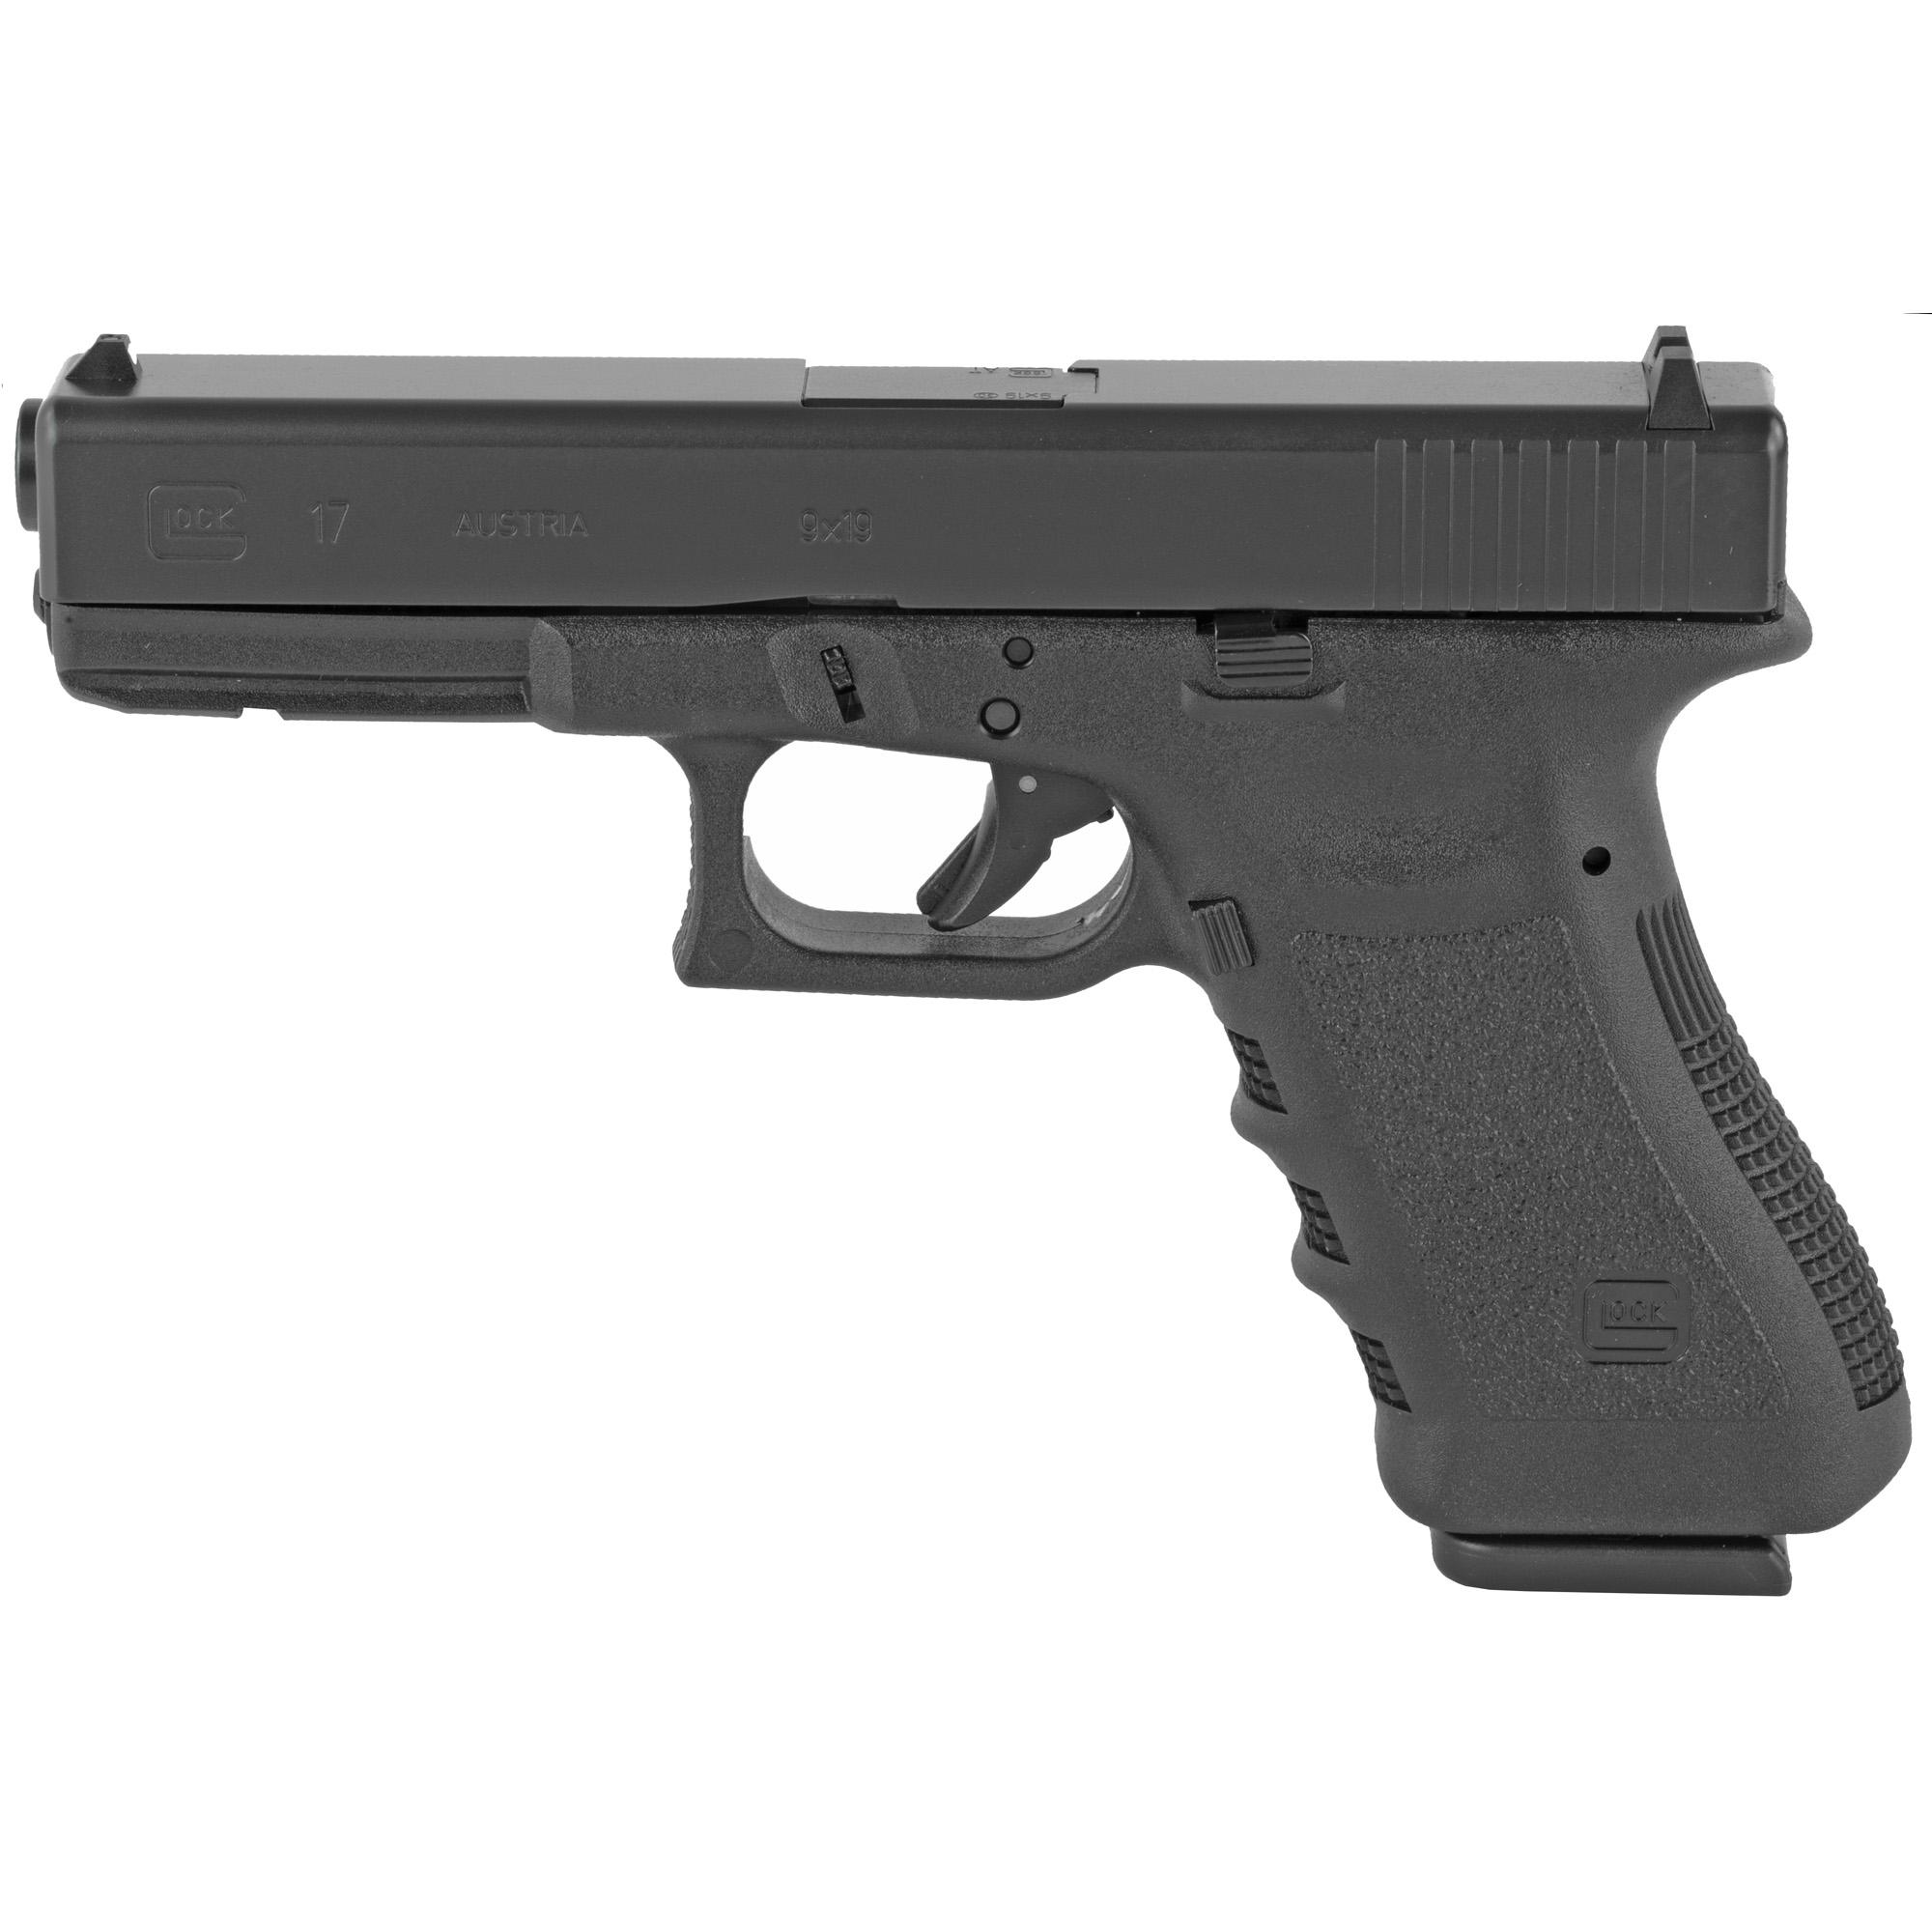 Glock 17 9mm 10rd